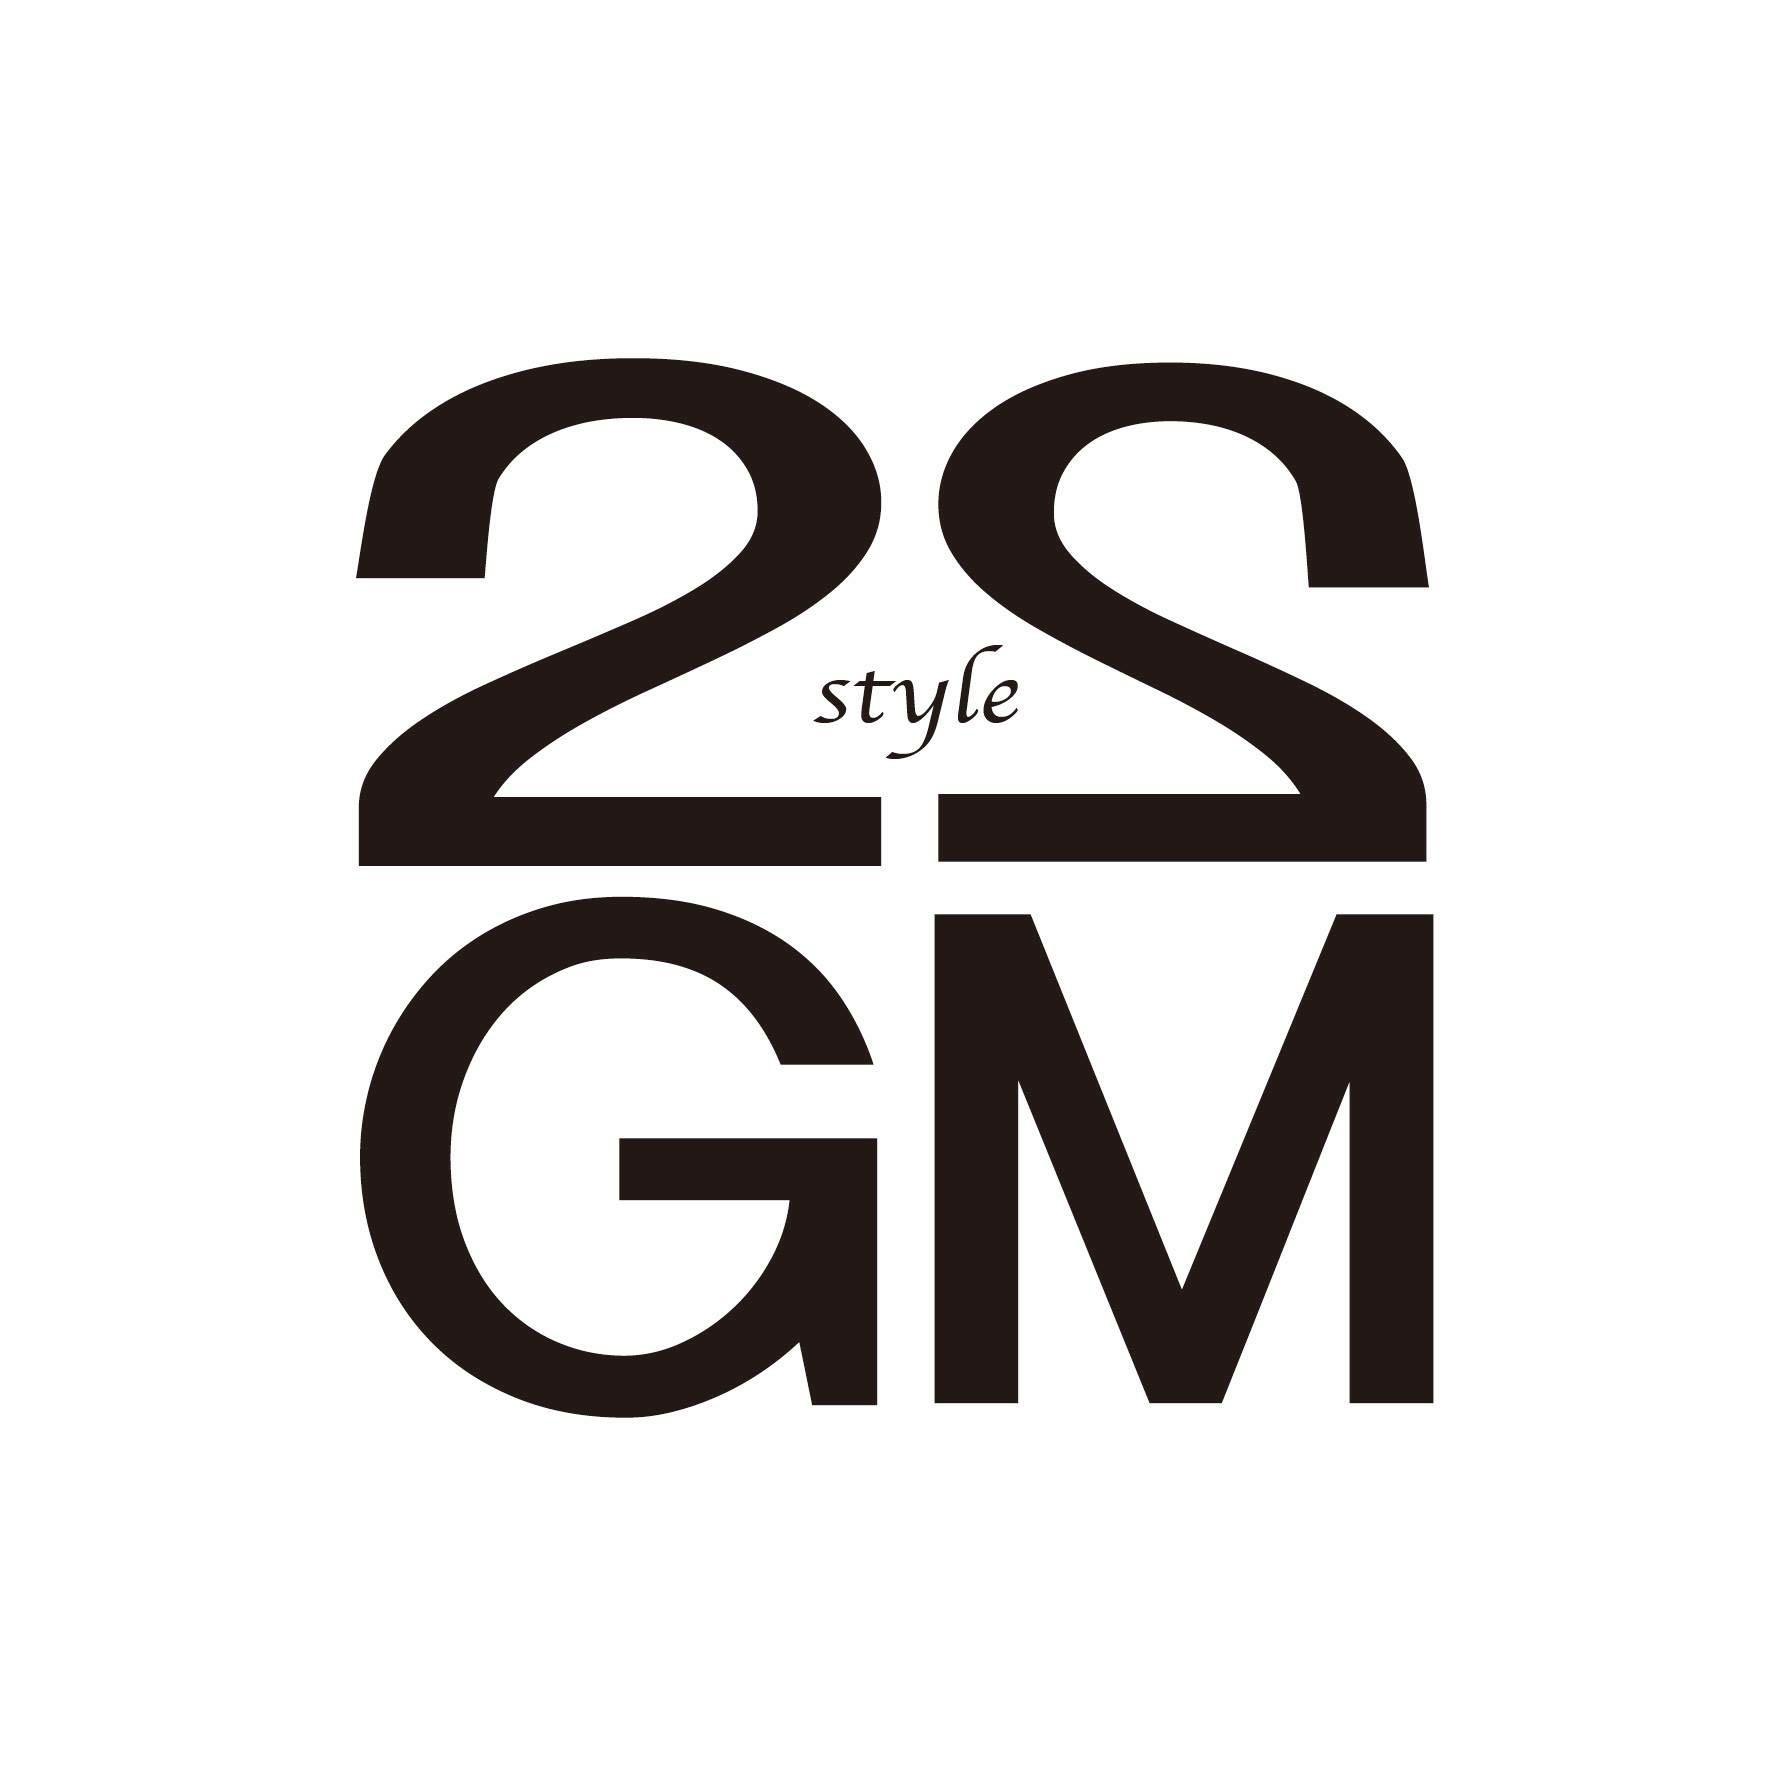 22gm.style